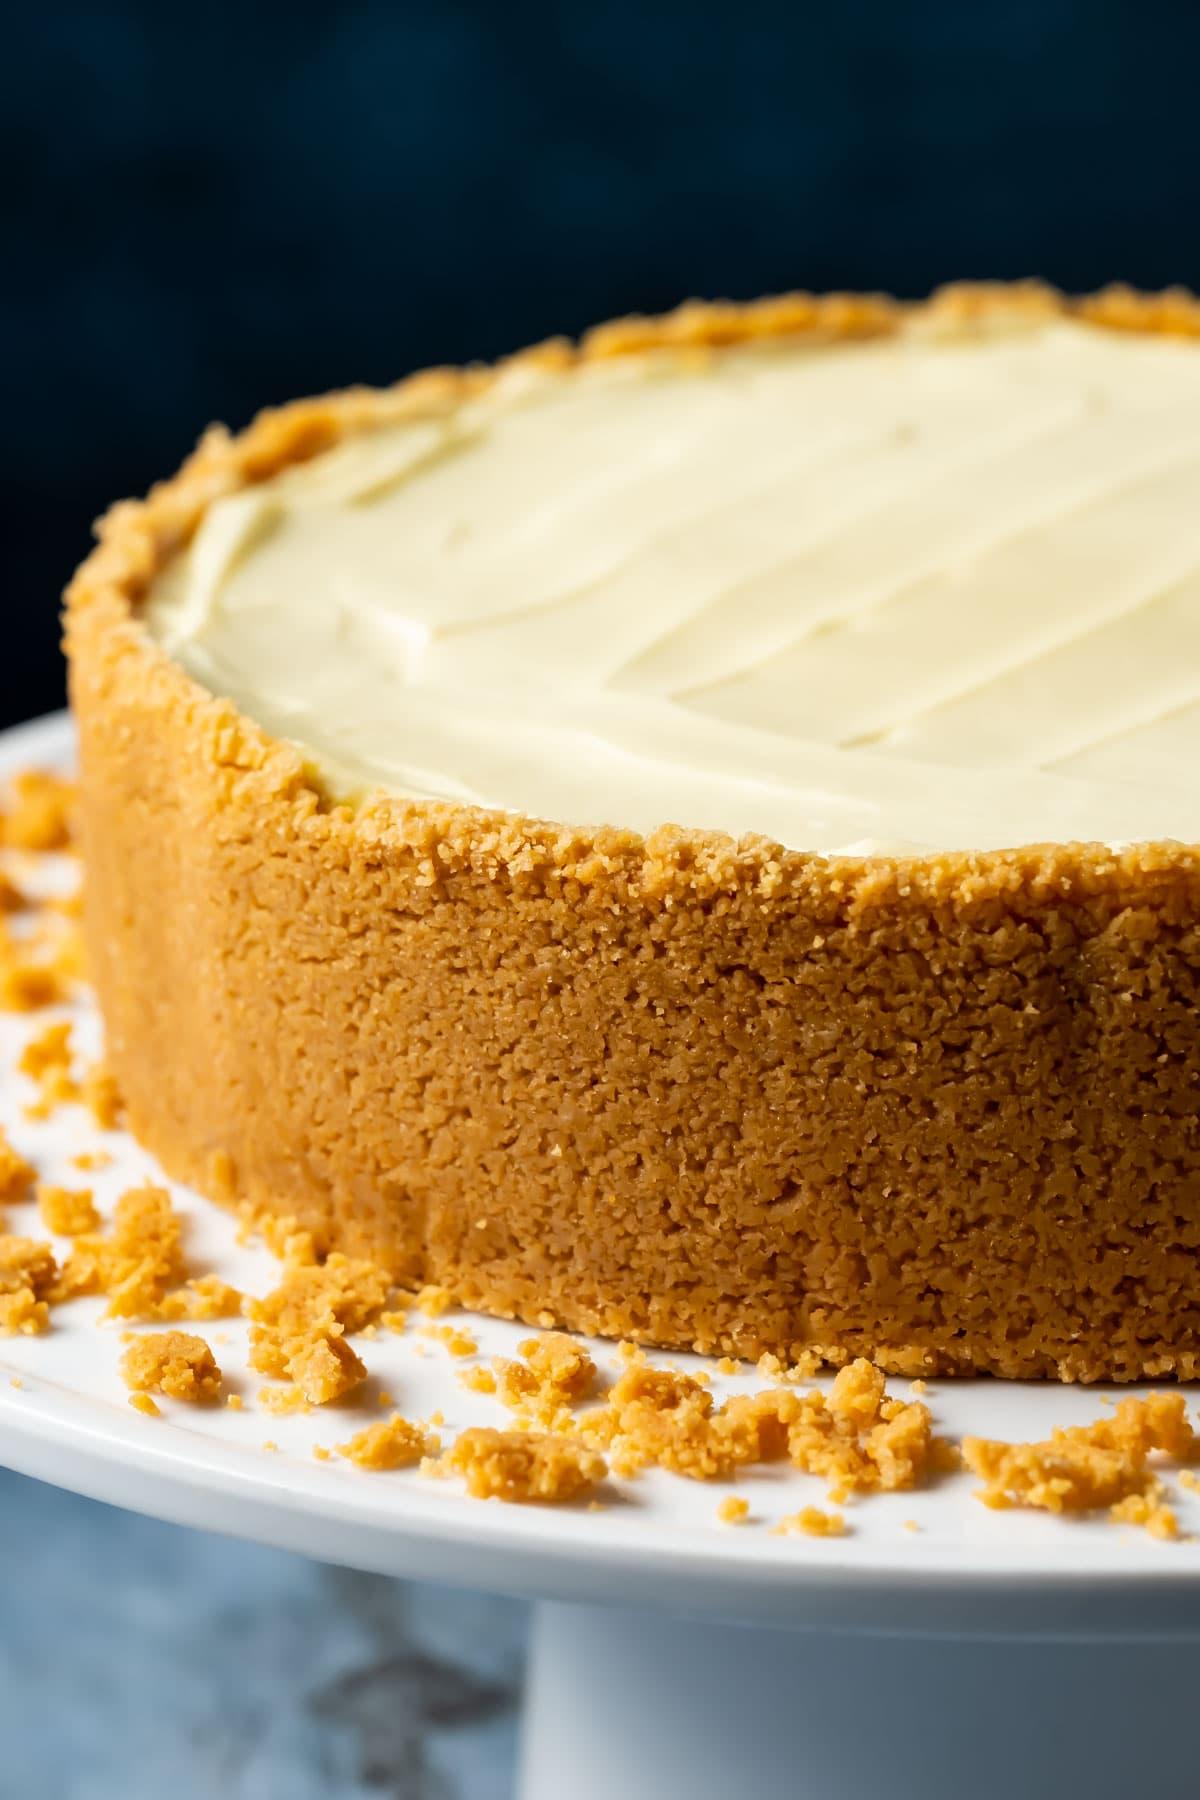 Eggless cheesecake on a white cake stand.